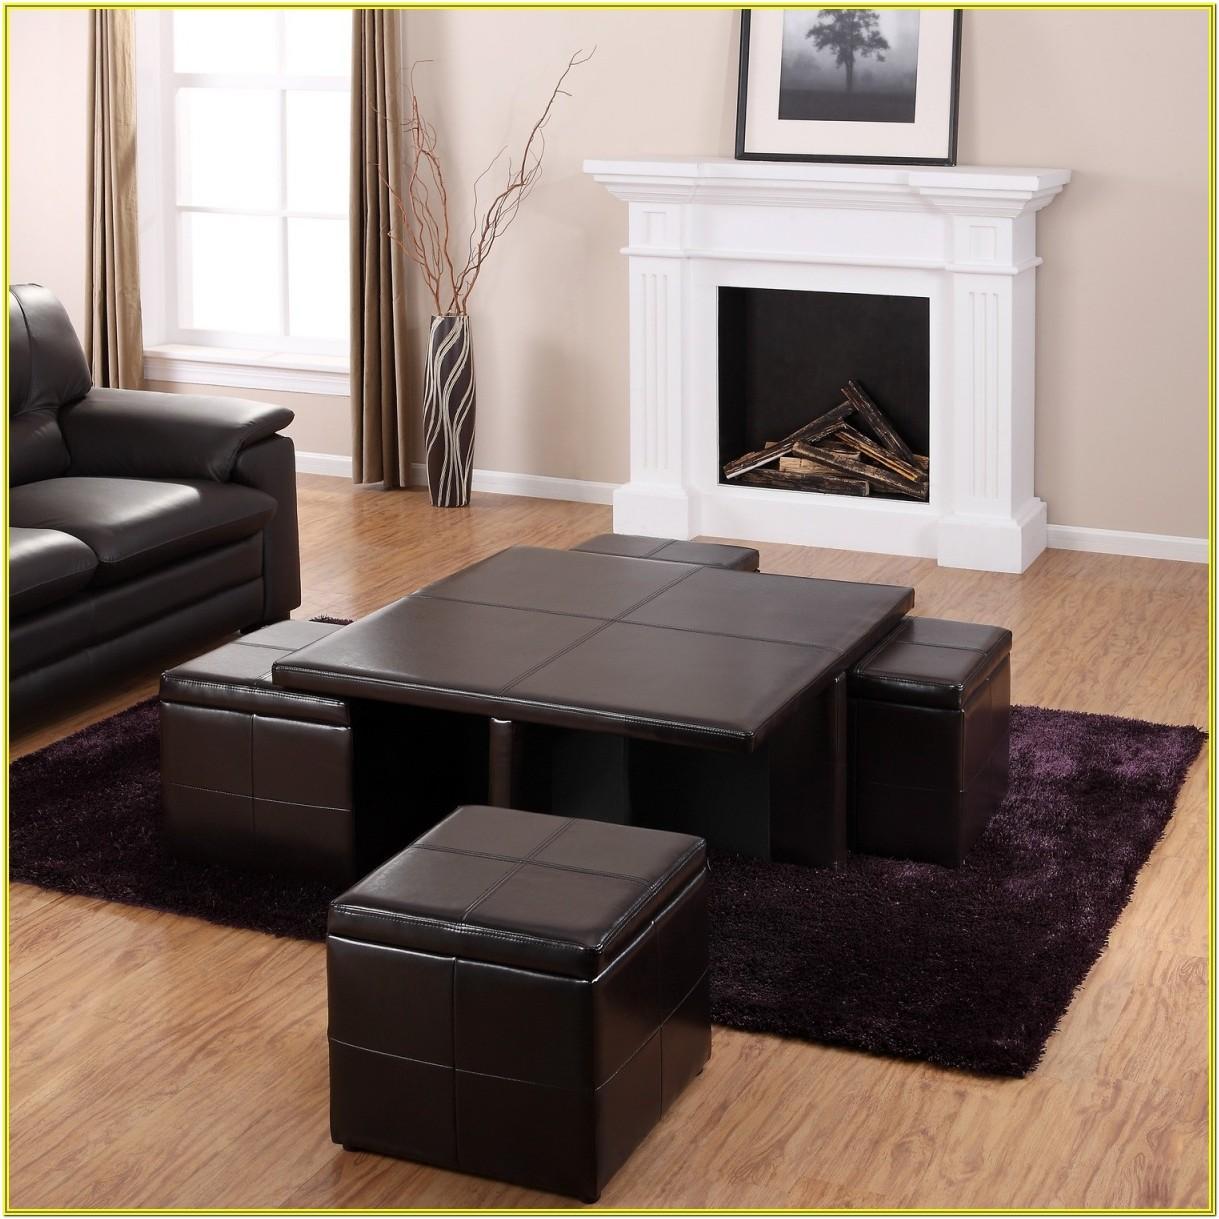 Living Room Ideas Brow Coffee Table